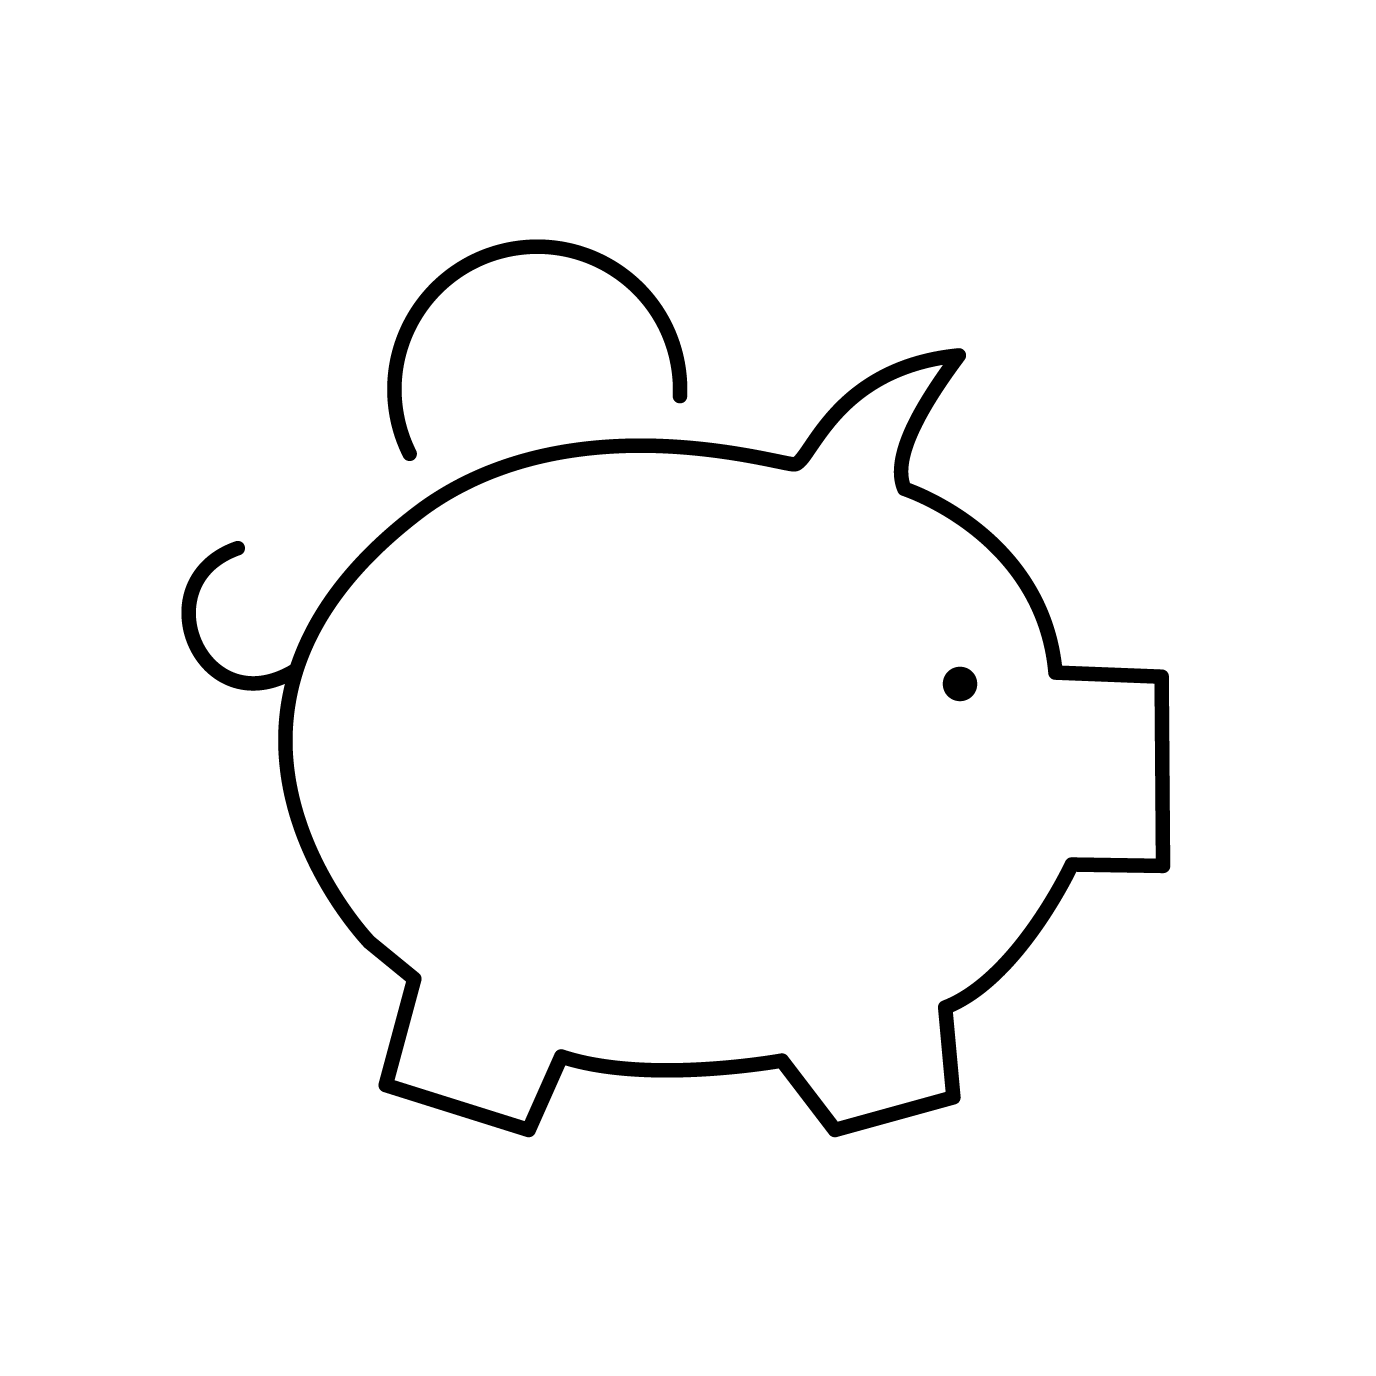 Finanzierung-bei-Comspot-Icon